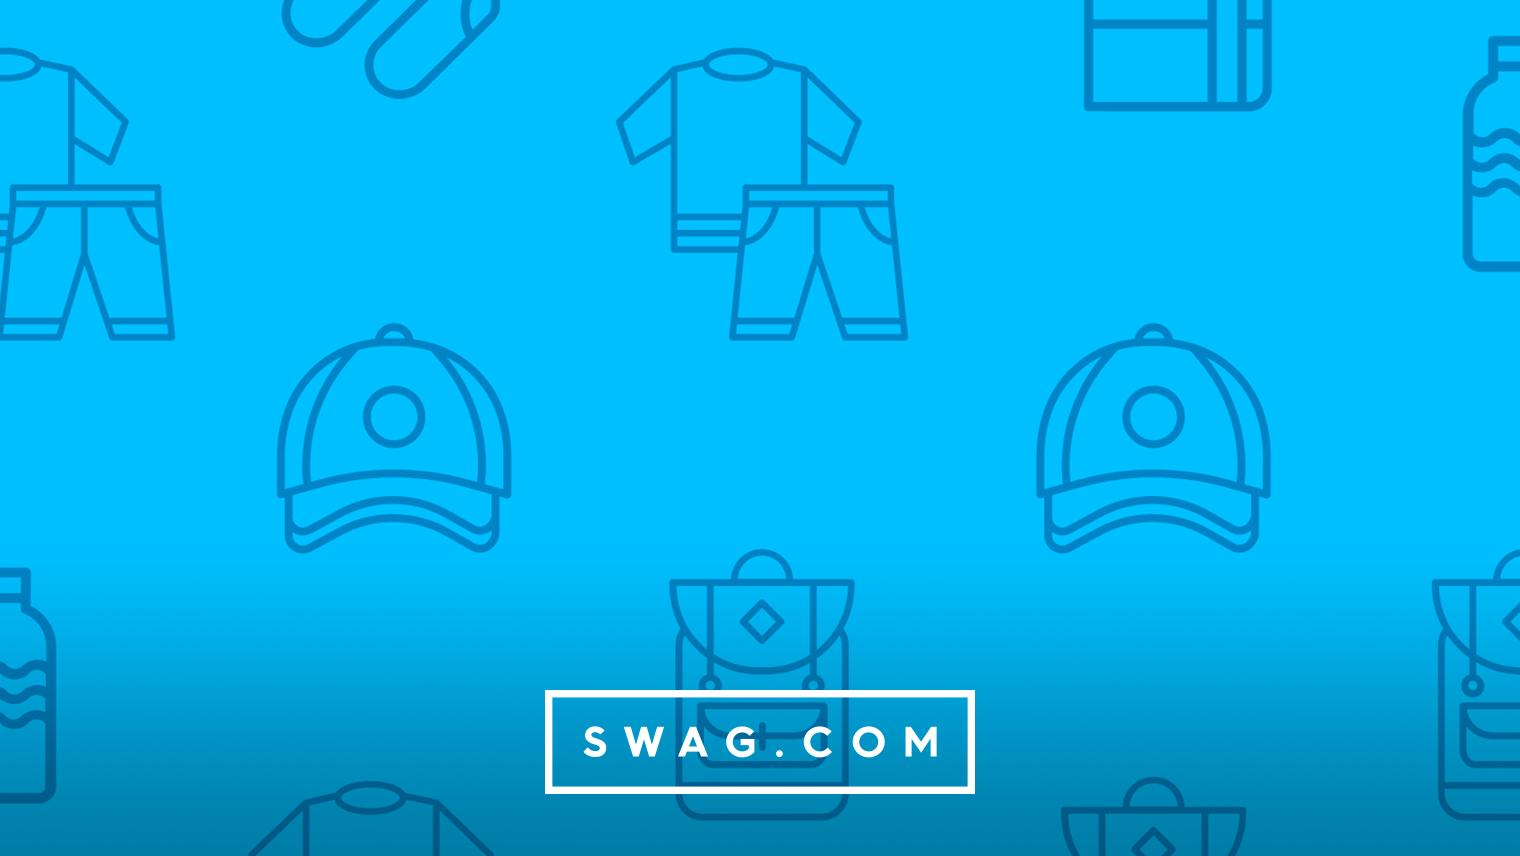 Popular New Swag Items